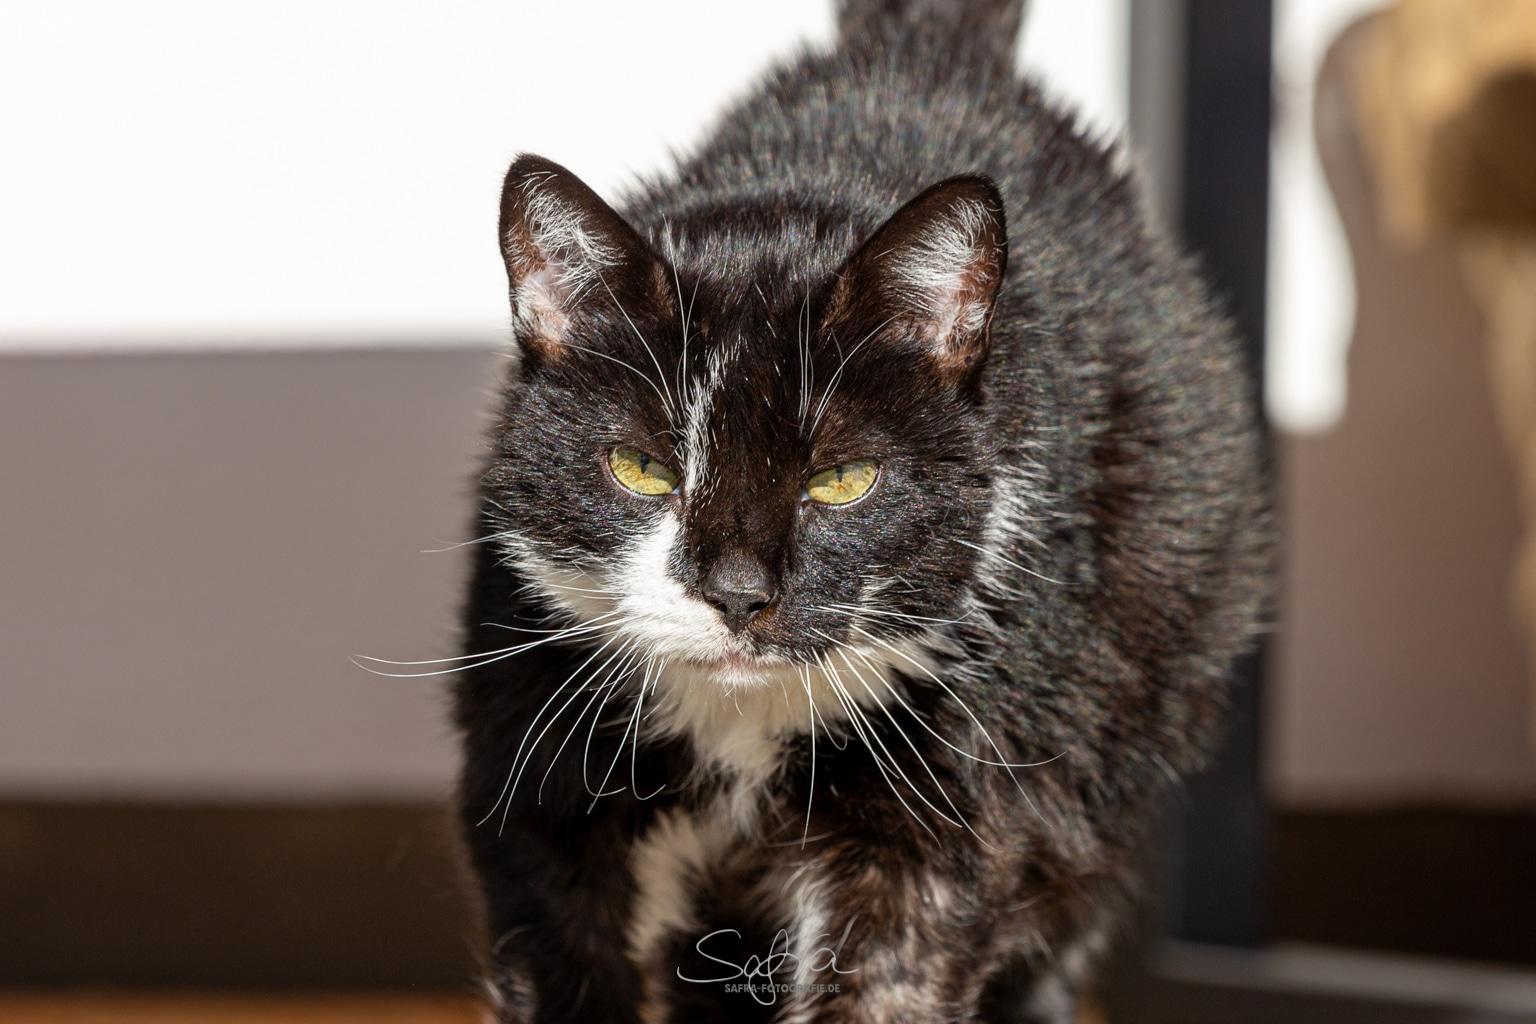 Schmidtens Katze Mittens